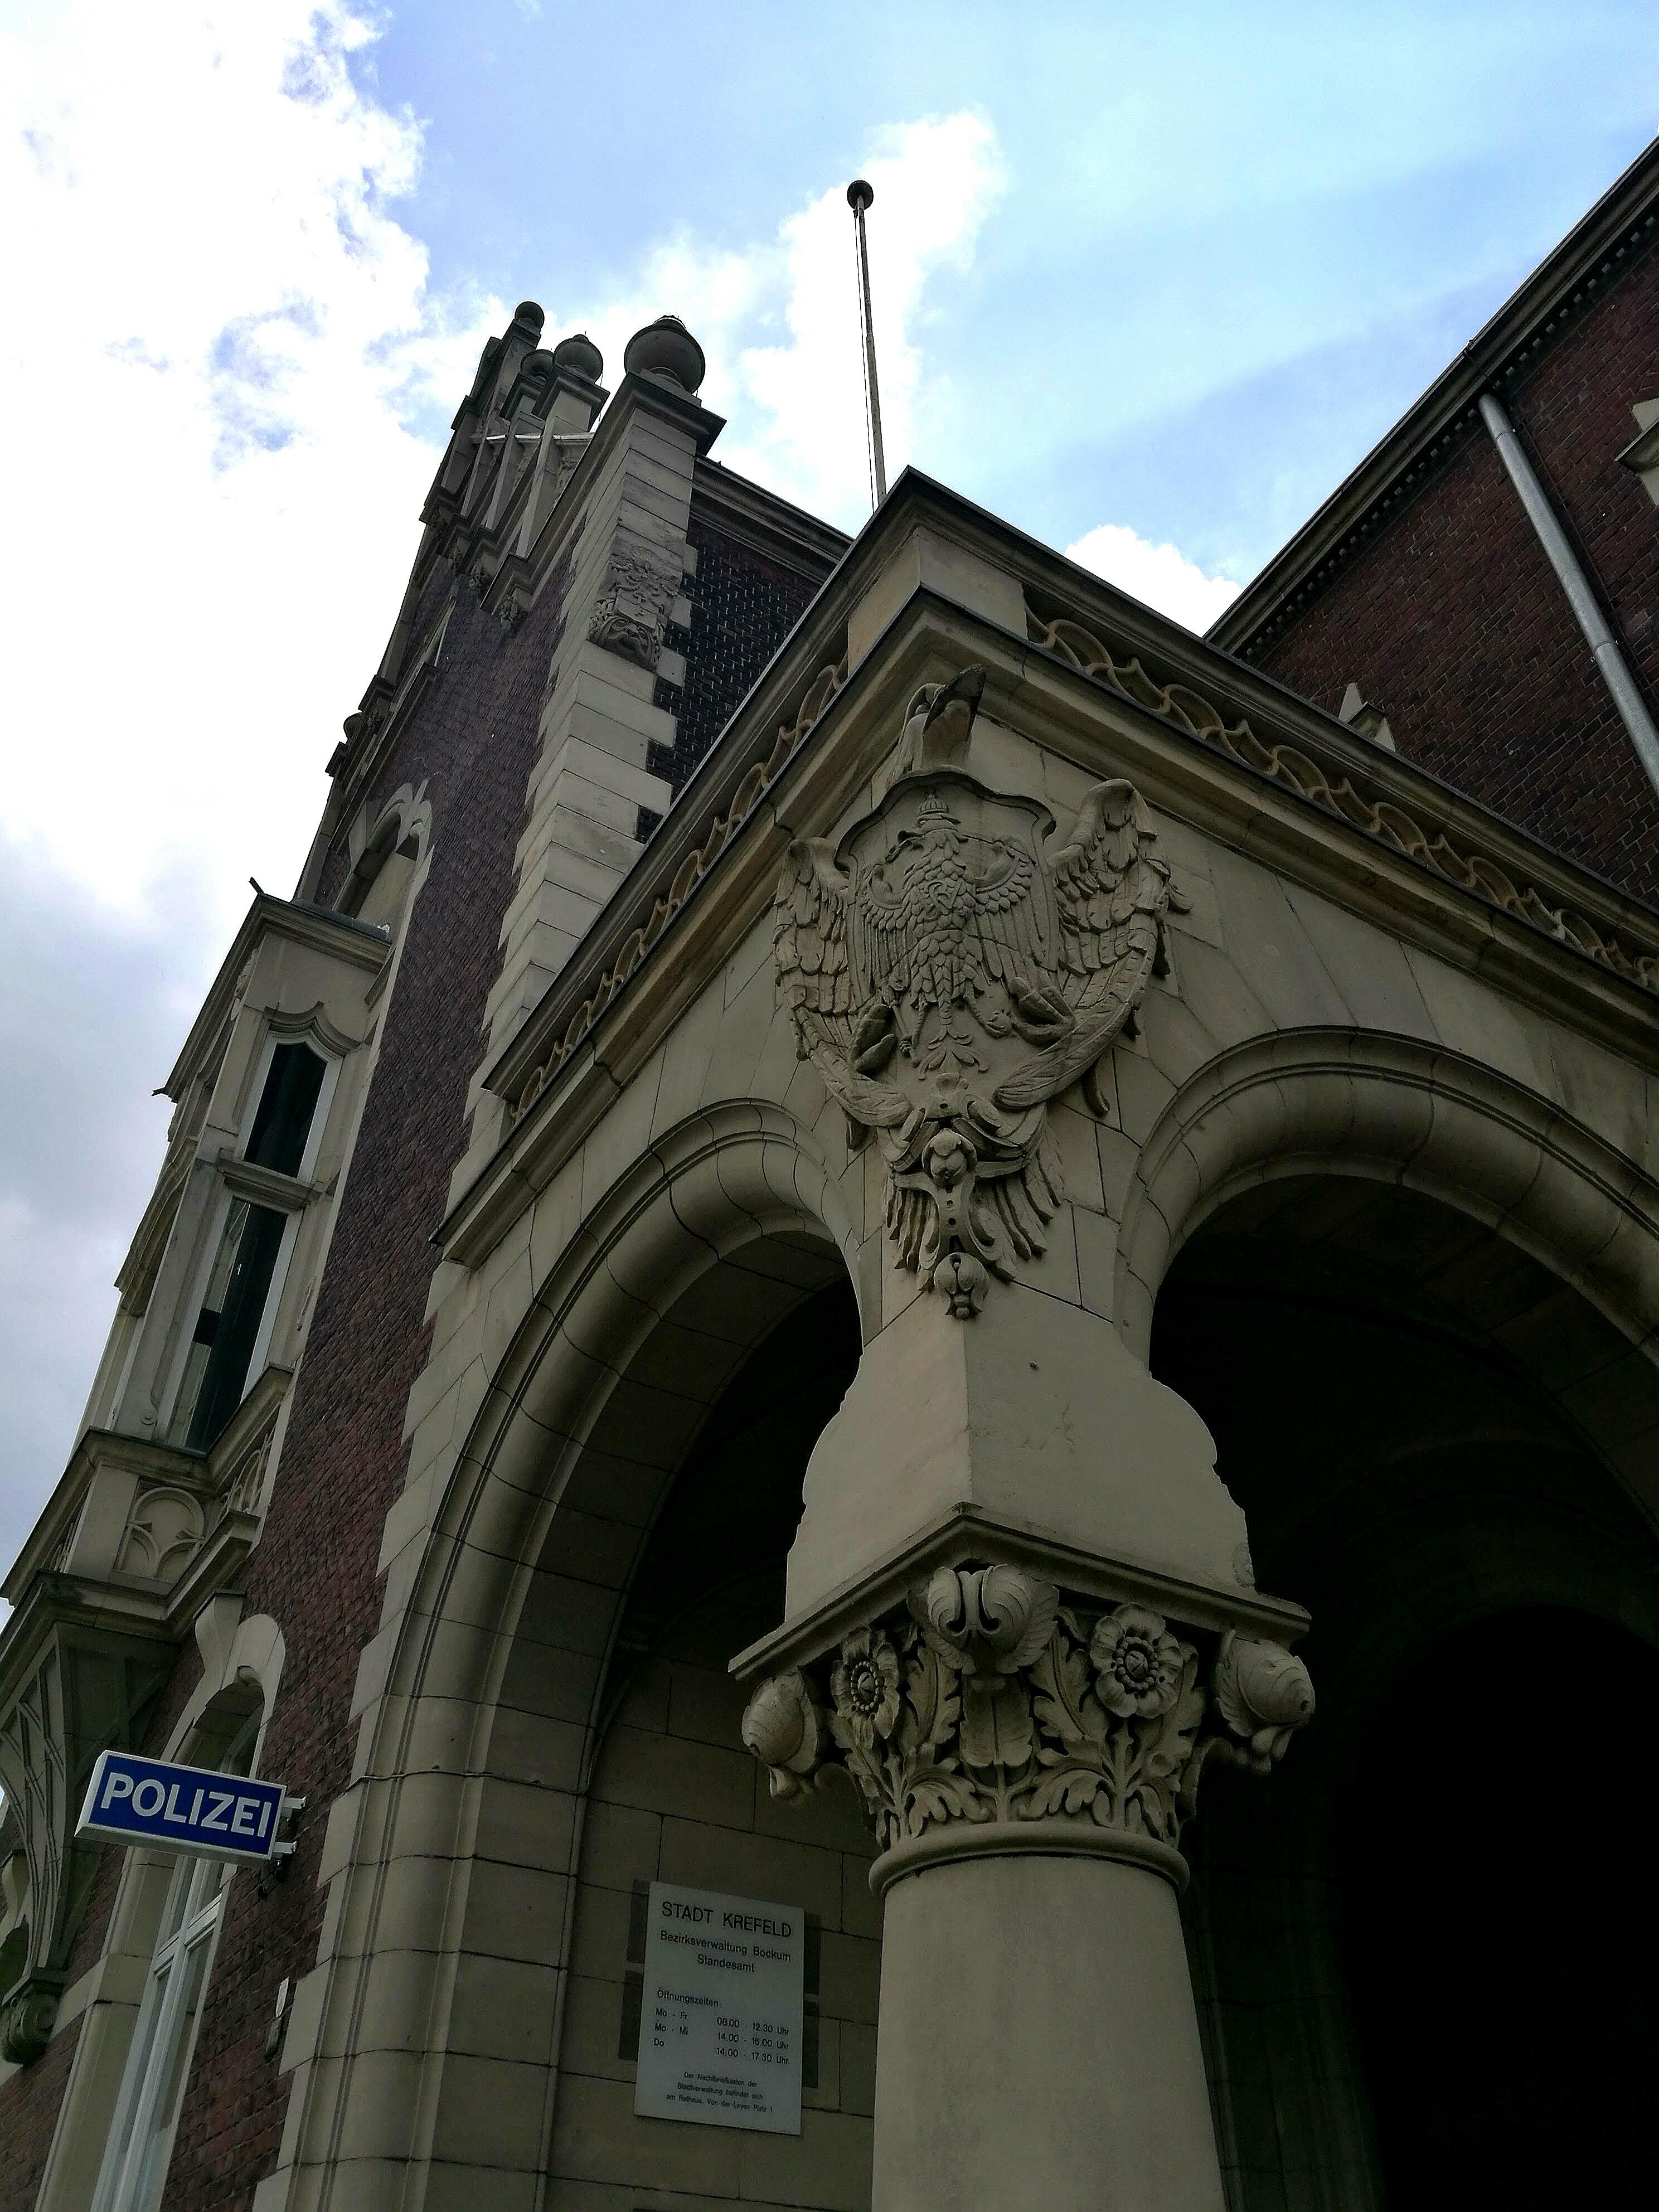 Doppeladler an der Säule des Bockumer Rathauses